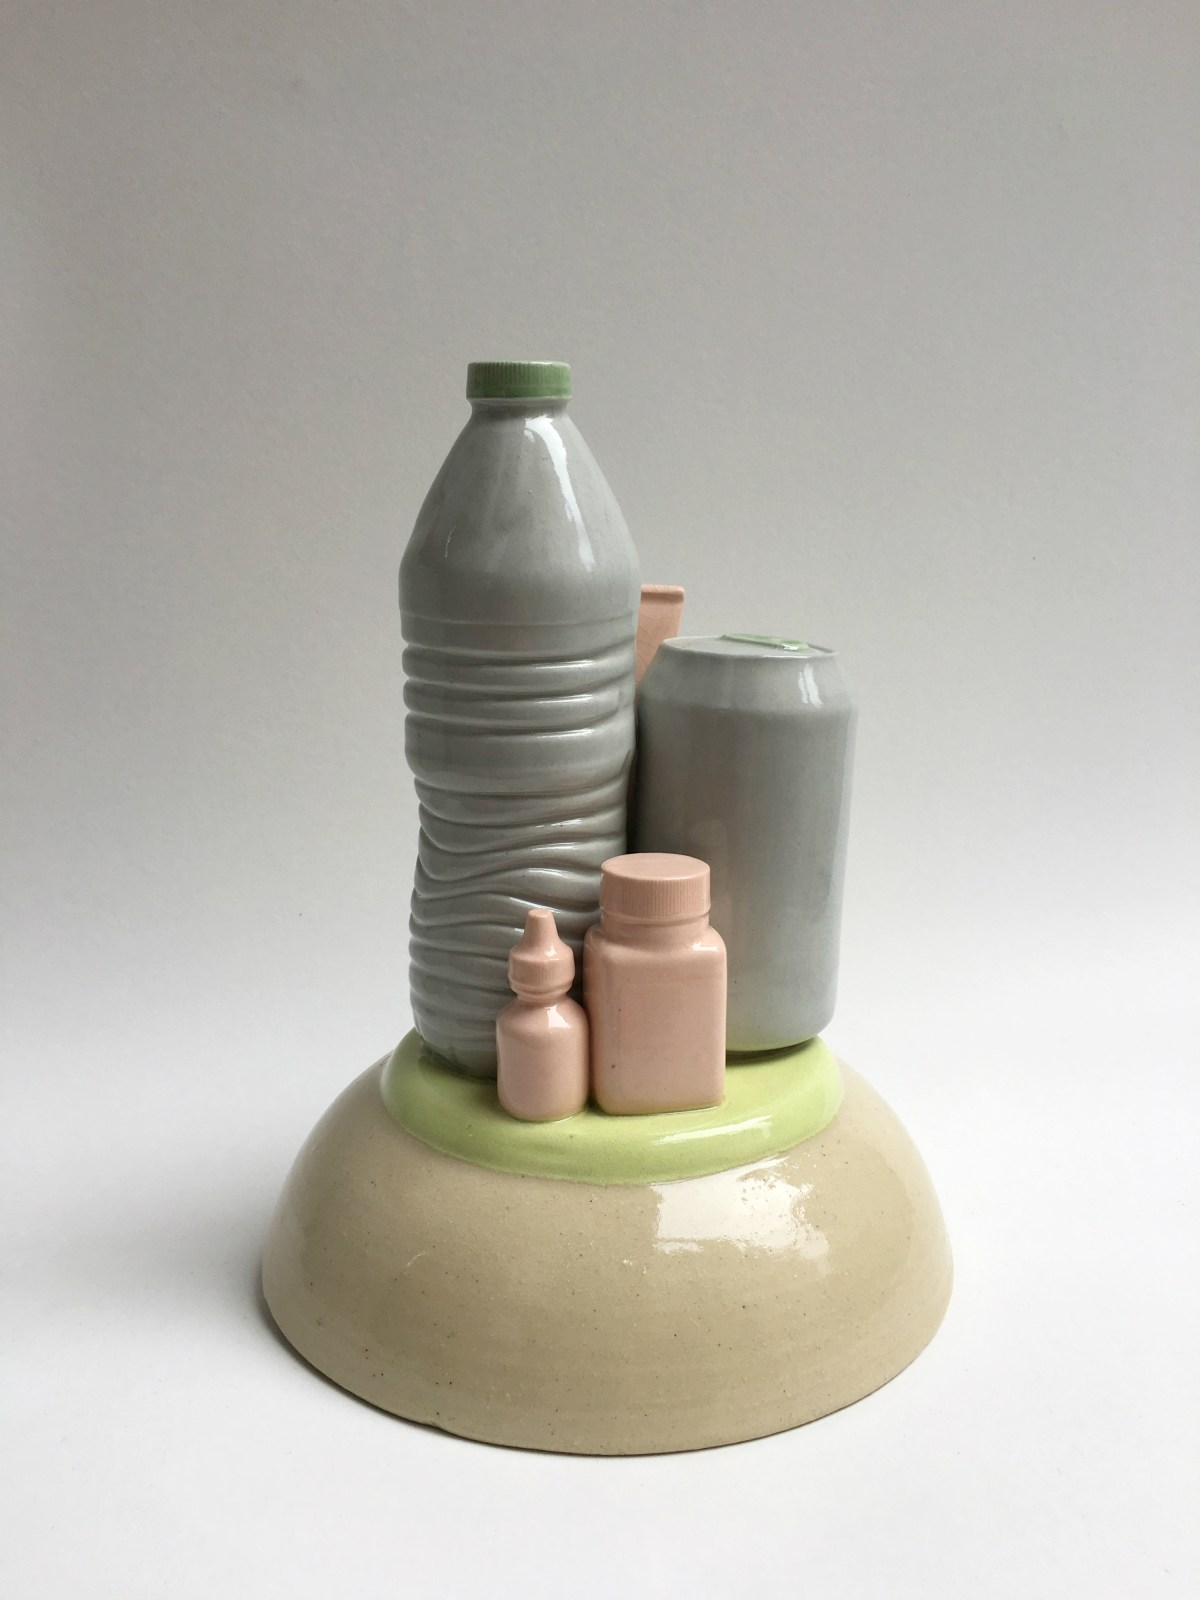 cerámica esmaltada